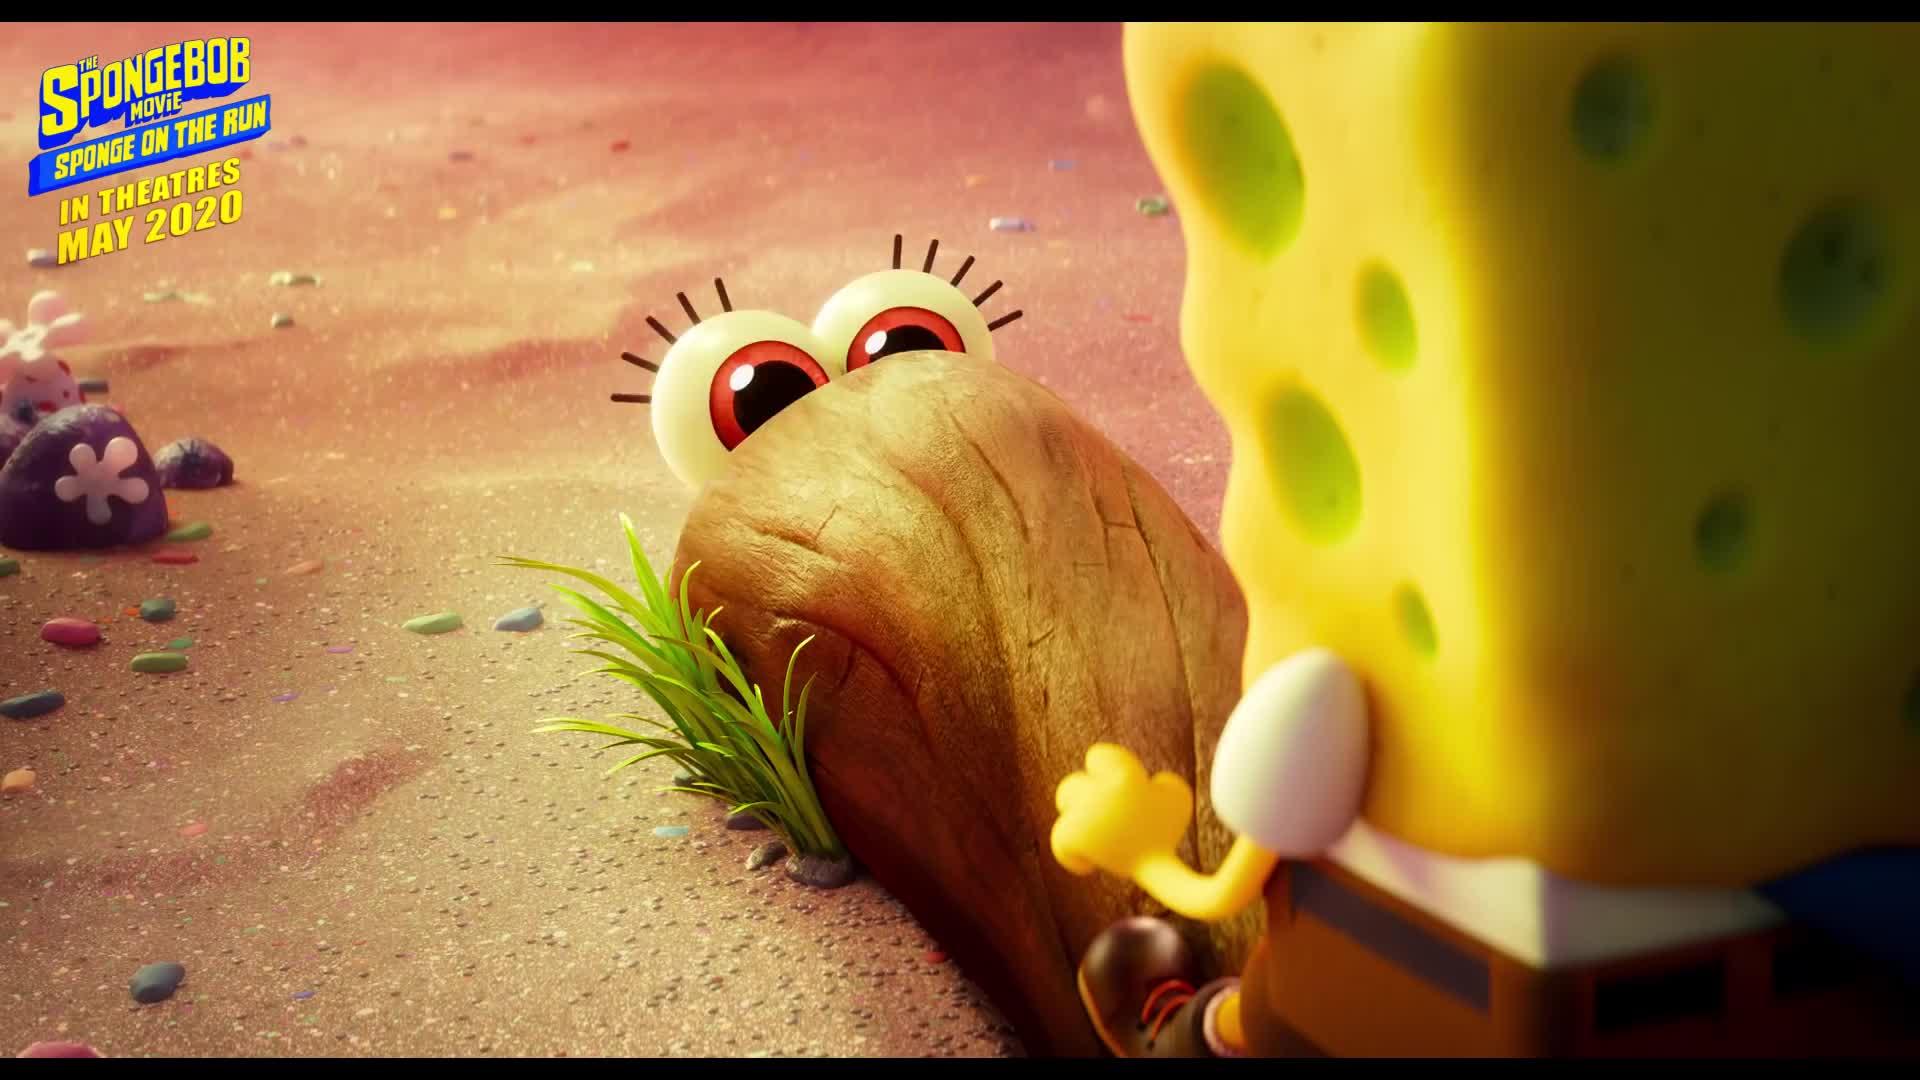 The SpongeBob Movie: Sponge on the Run - Official Trailer #1 [HD] screen capture